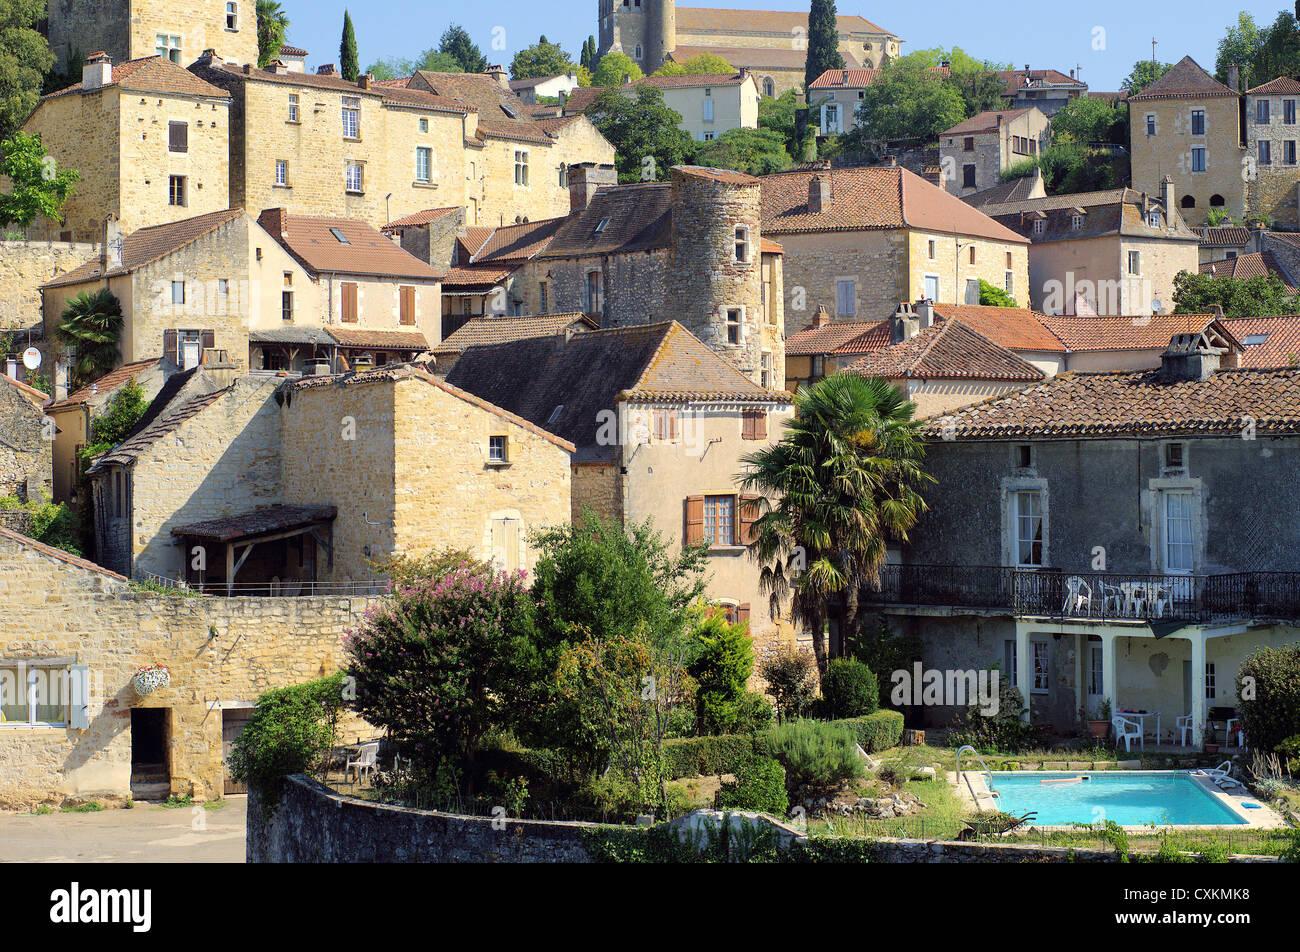 Village Puy i'Evegue Lot et Garonne France - Stock Image